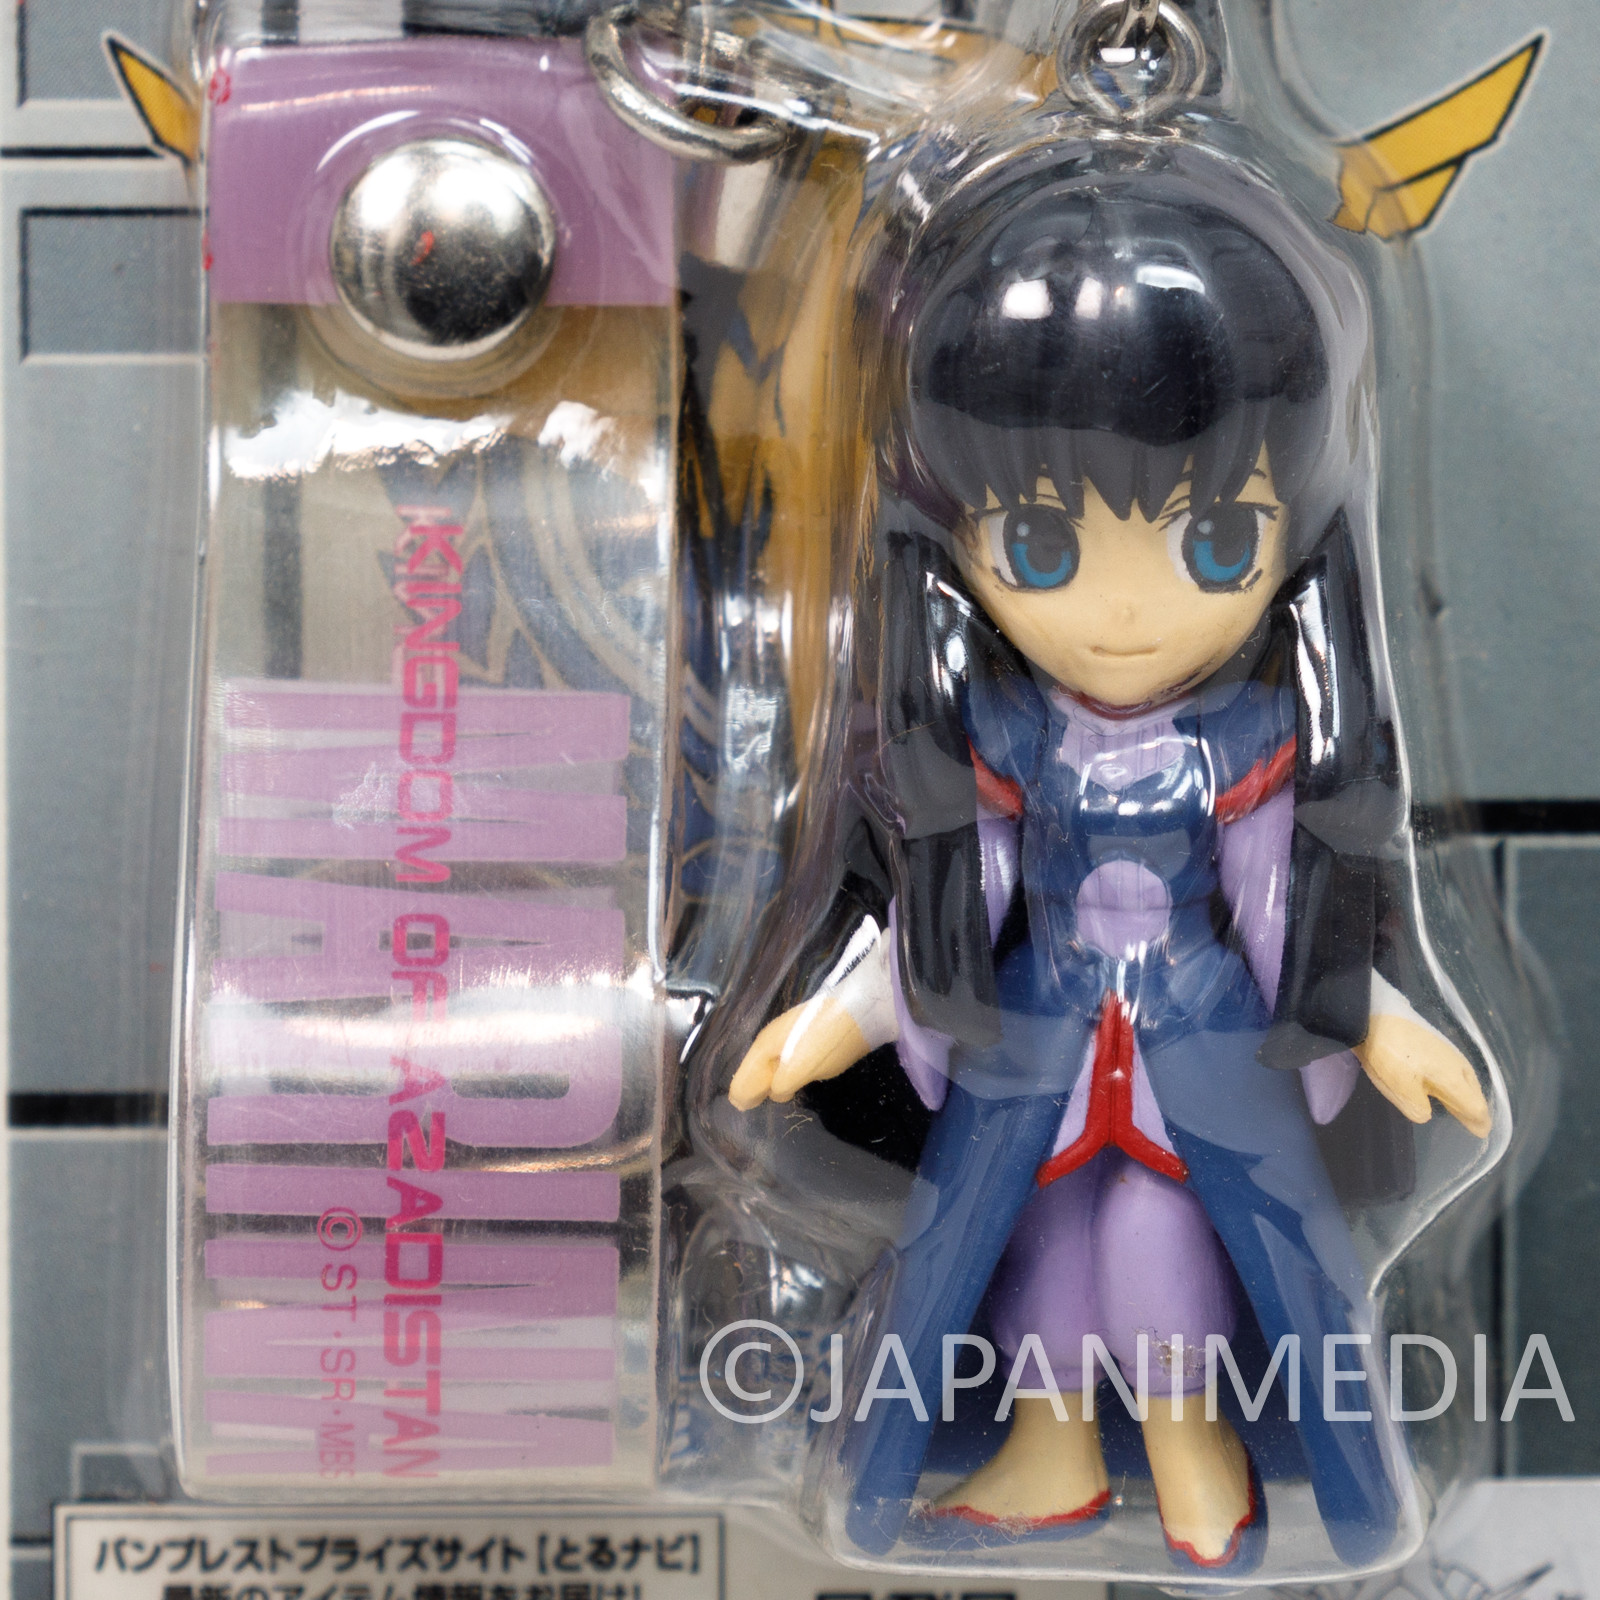 Mobile Suit Gundam 00 Marina Ismail Figure Strap Banpresto JAPAN